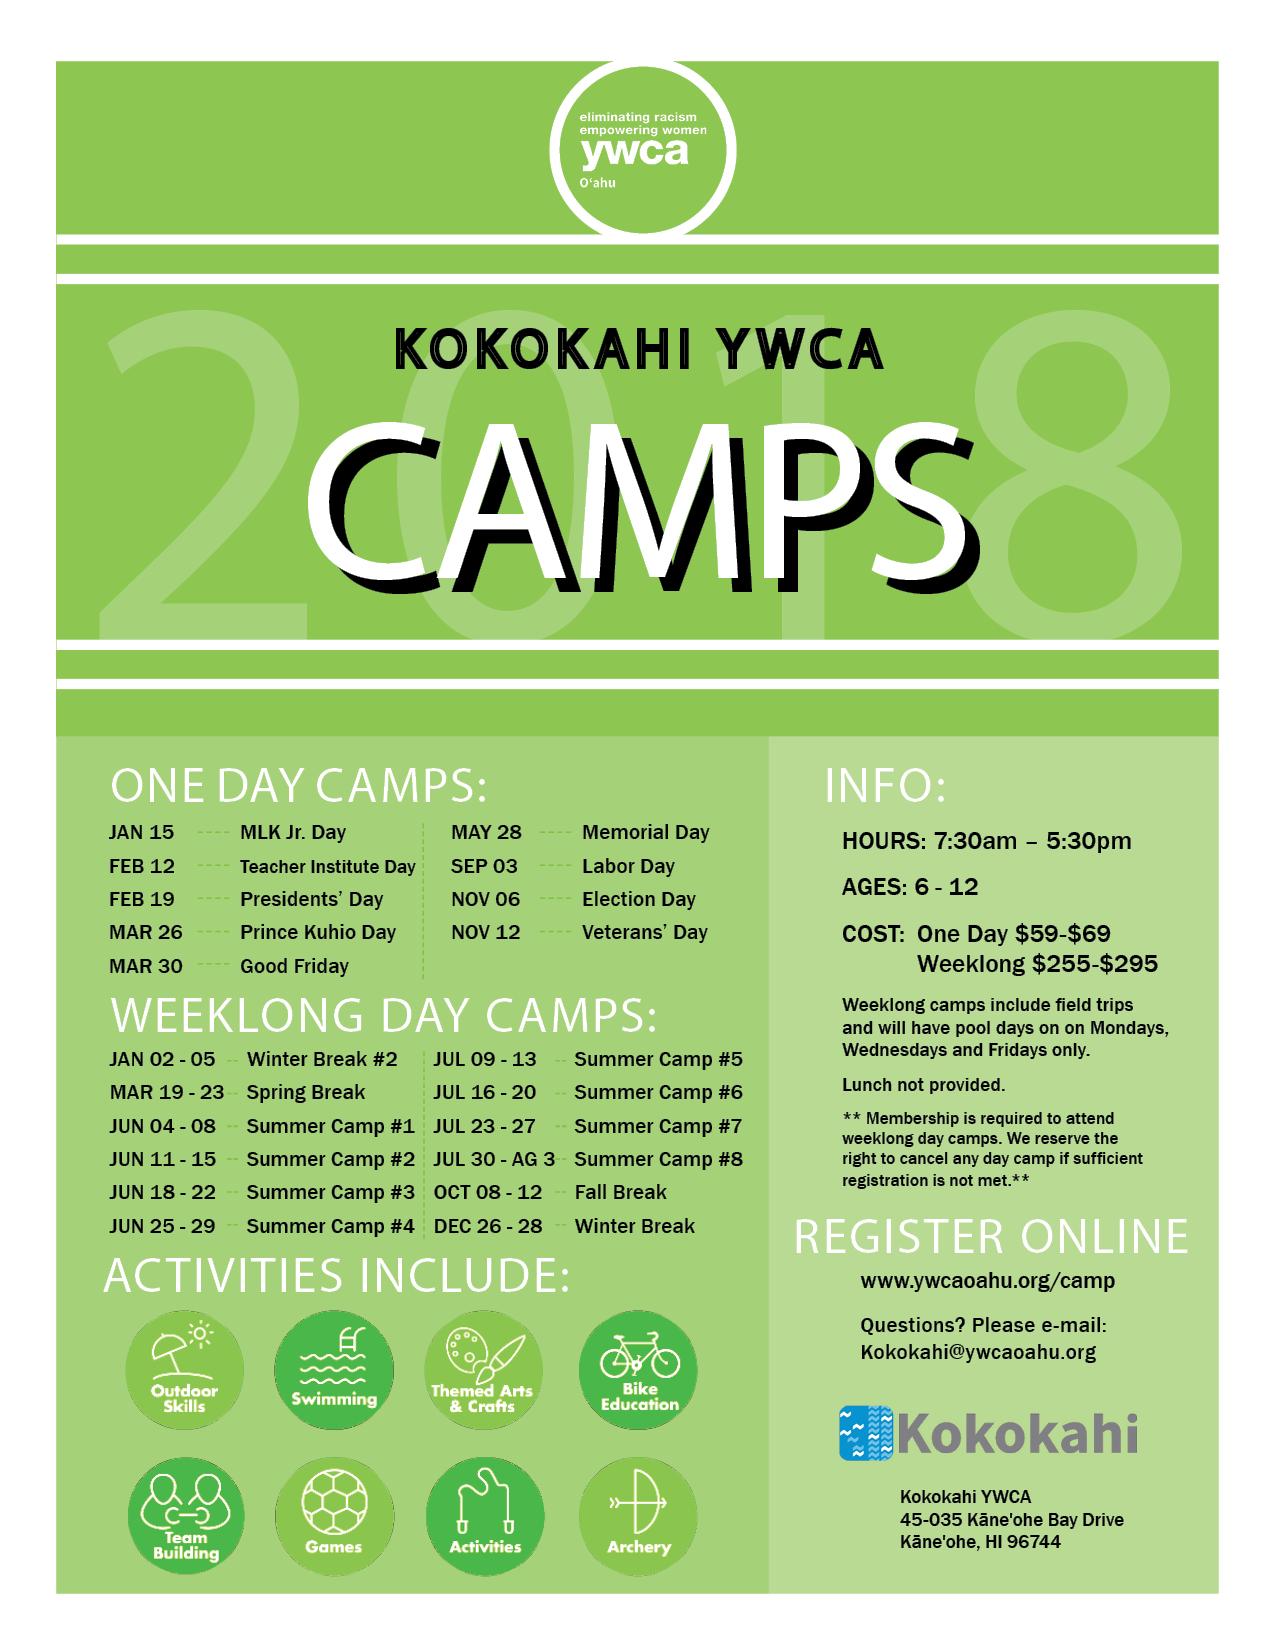 Kokokahi Camps flyer 2018.png